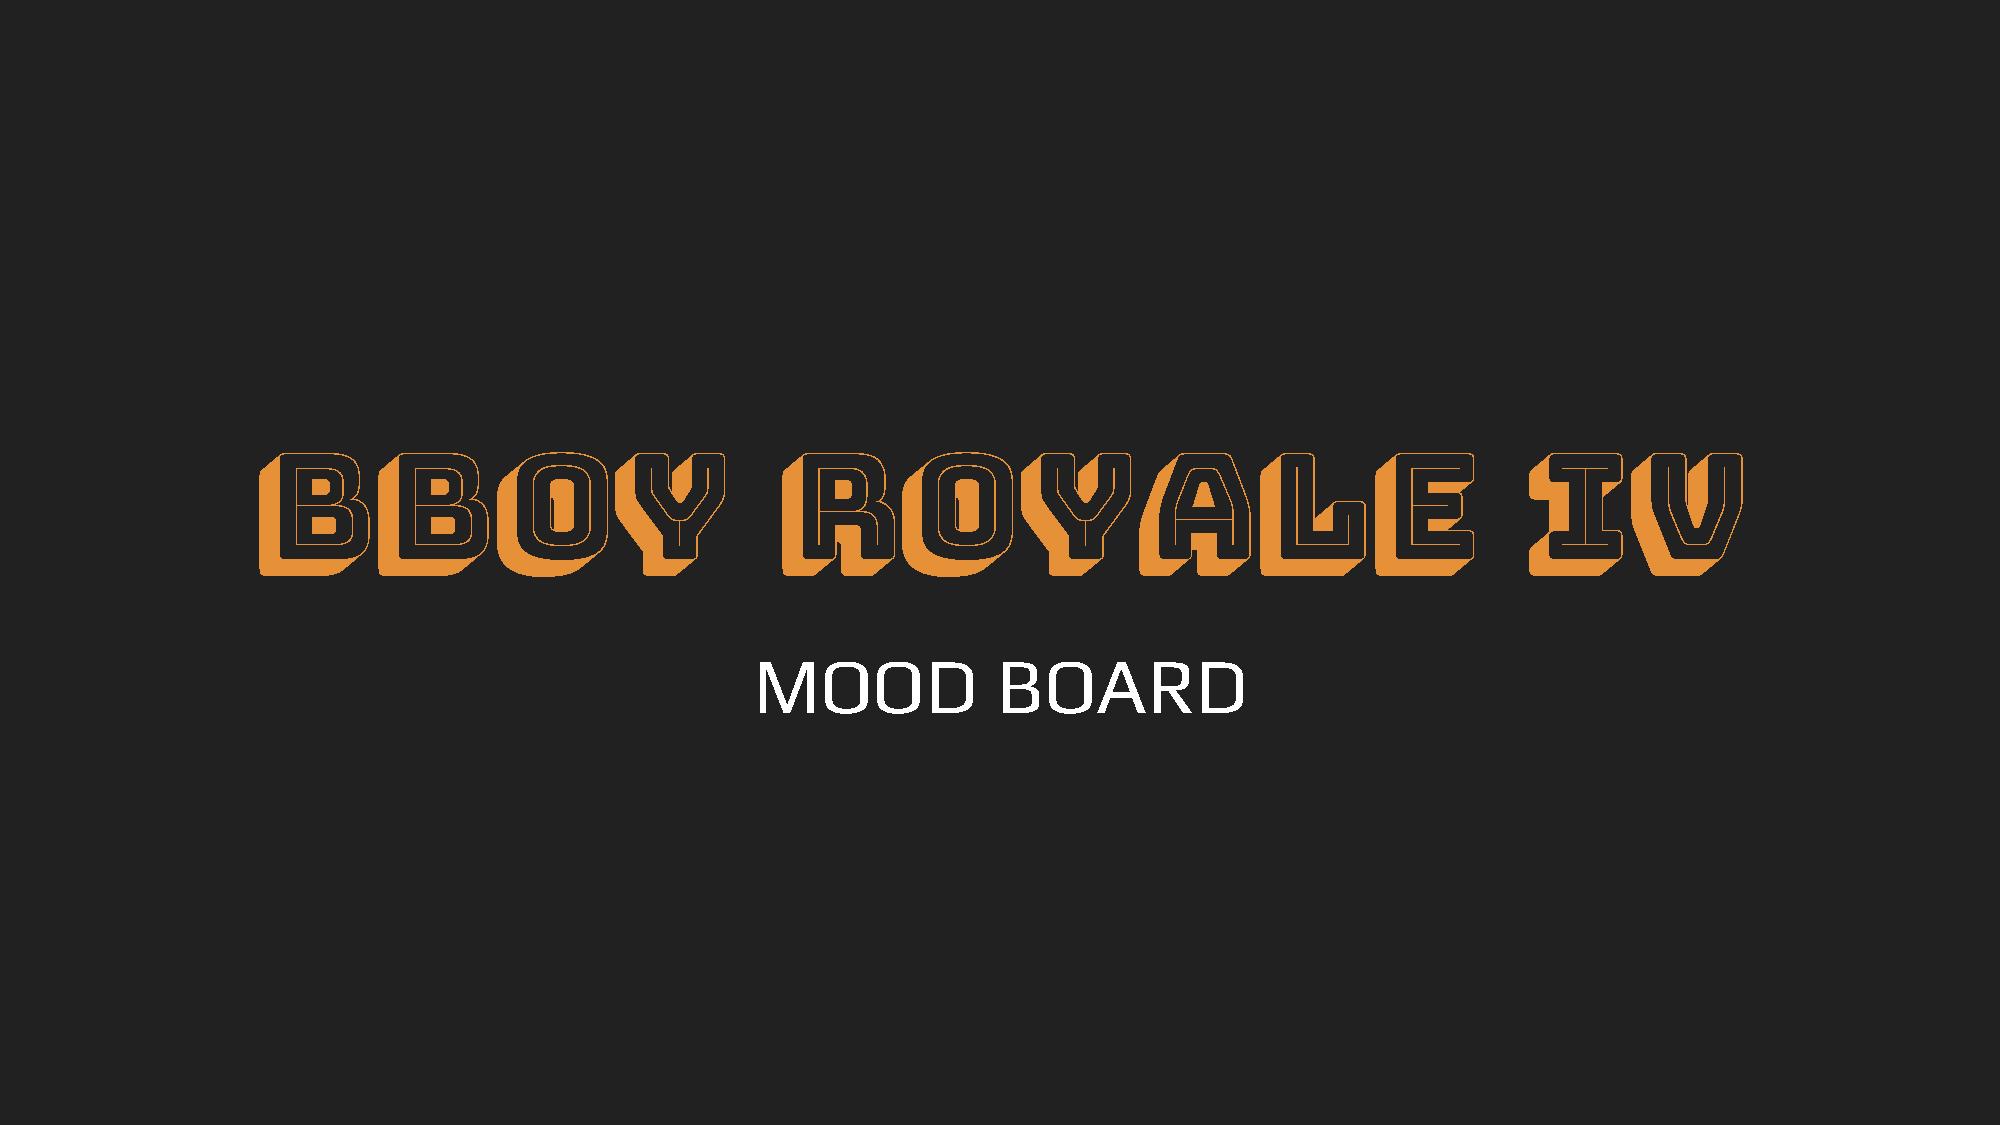 B-Boy Royale 4 Mood Board_Page_01